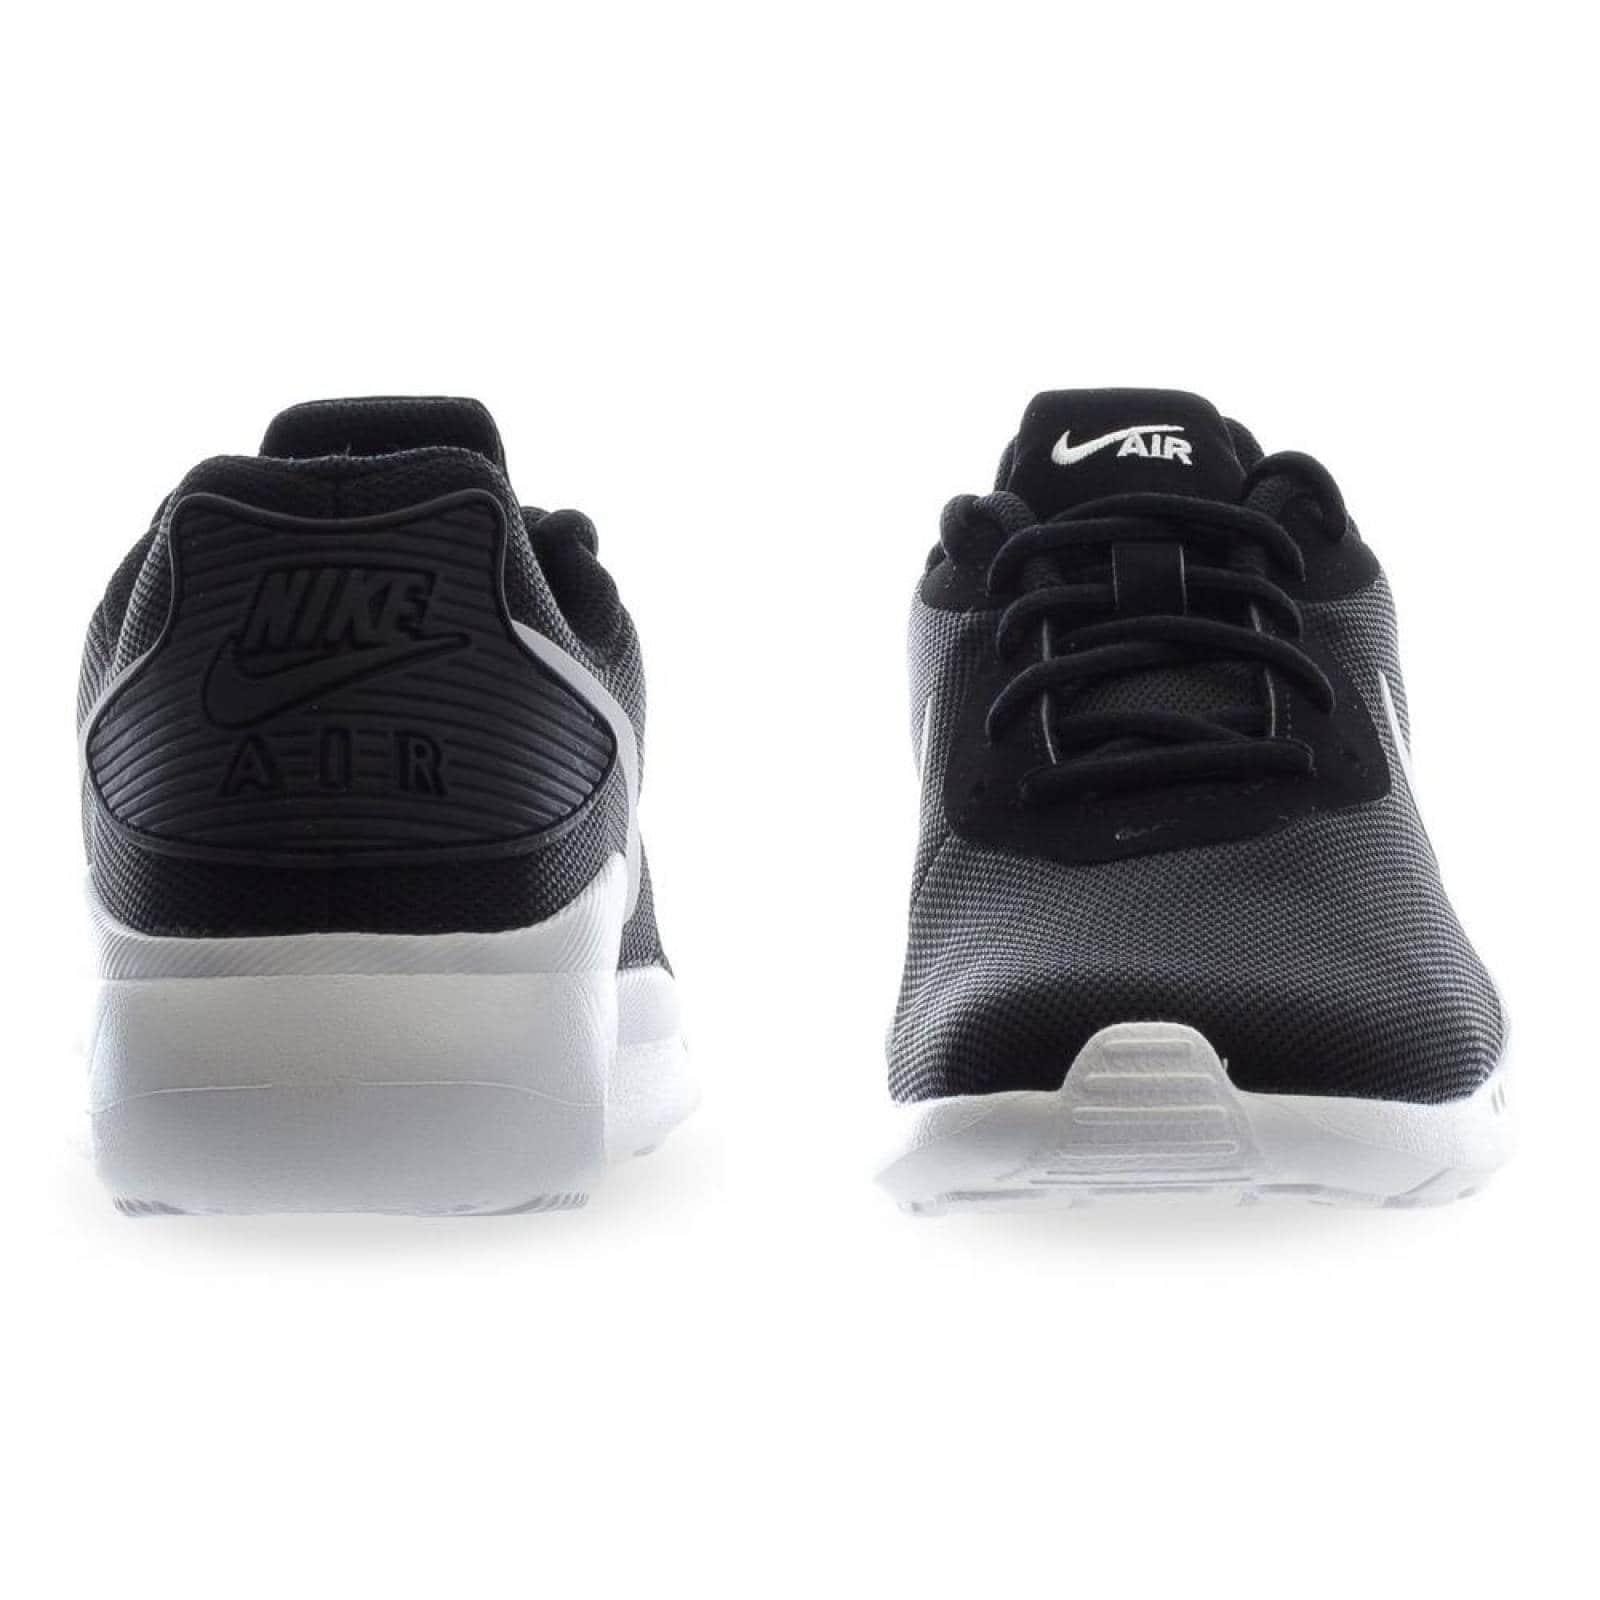 Tenis Nike Air Max Oketo AQ2231002 Negro Mujer